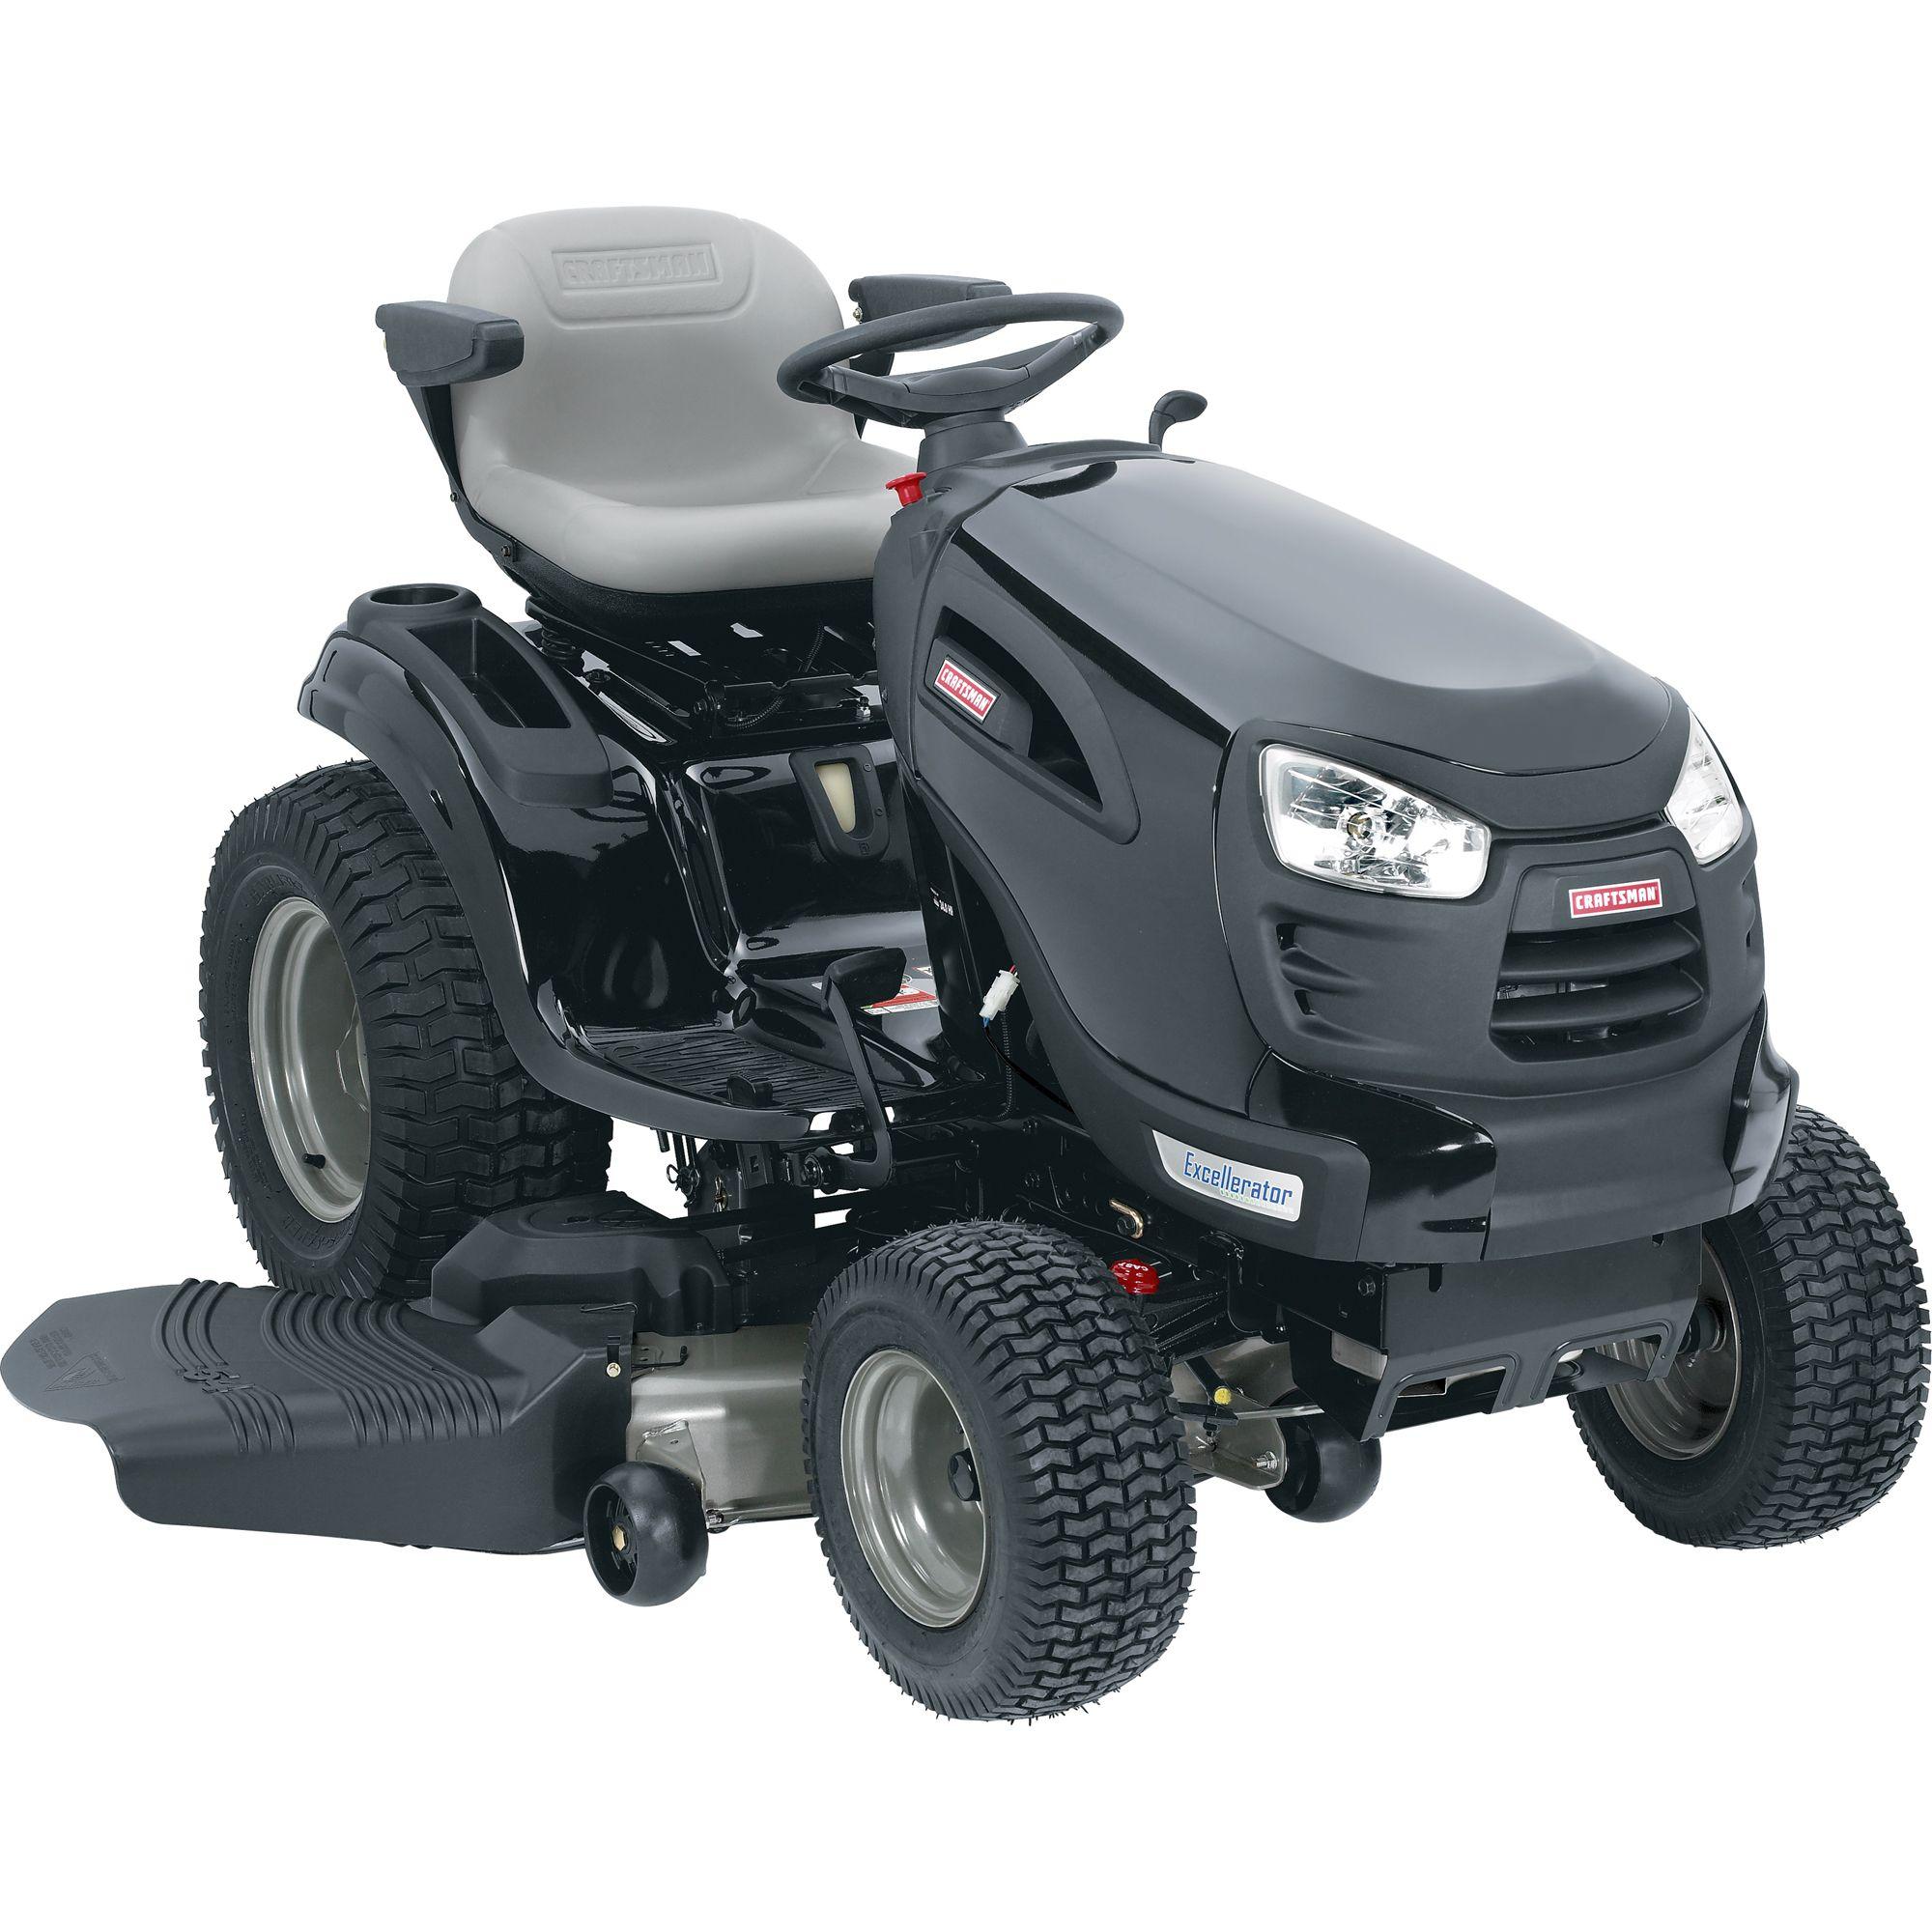 medium resolution of craftsman 28947 gt 5000 54 kohler 26 hp gas powered riding garden tractor